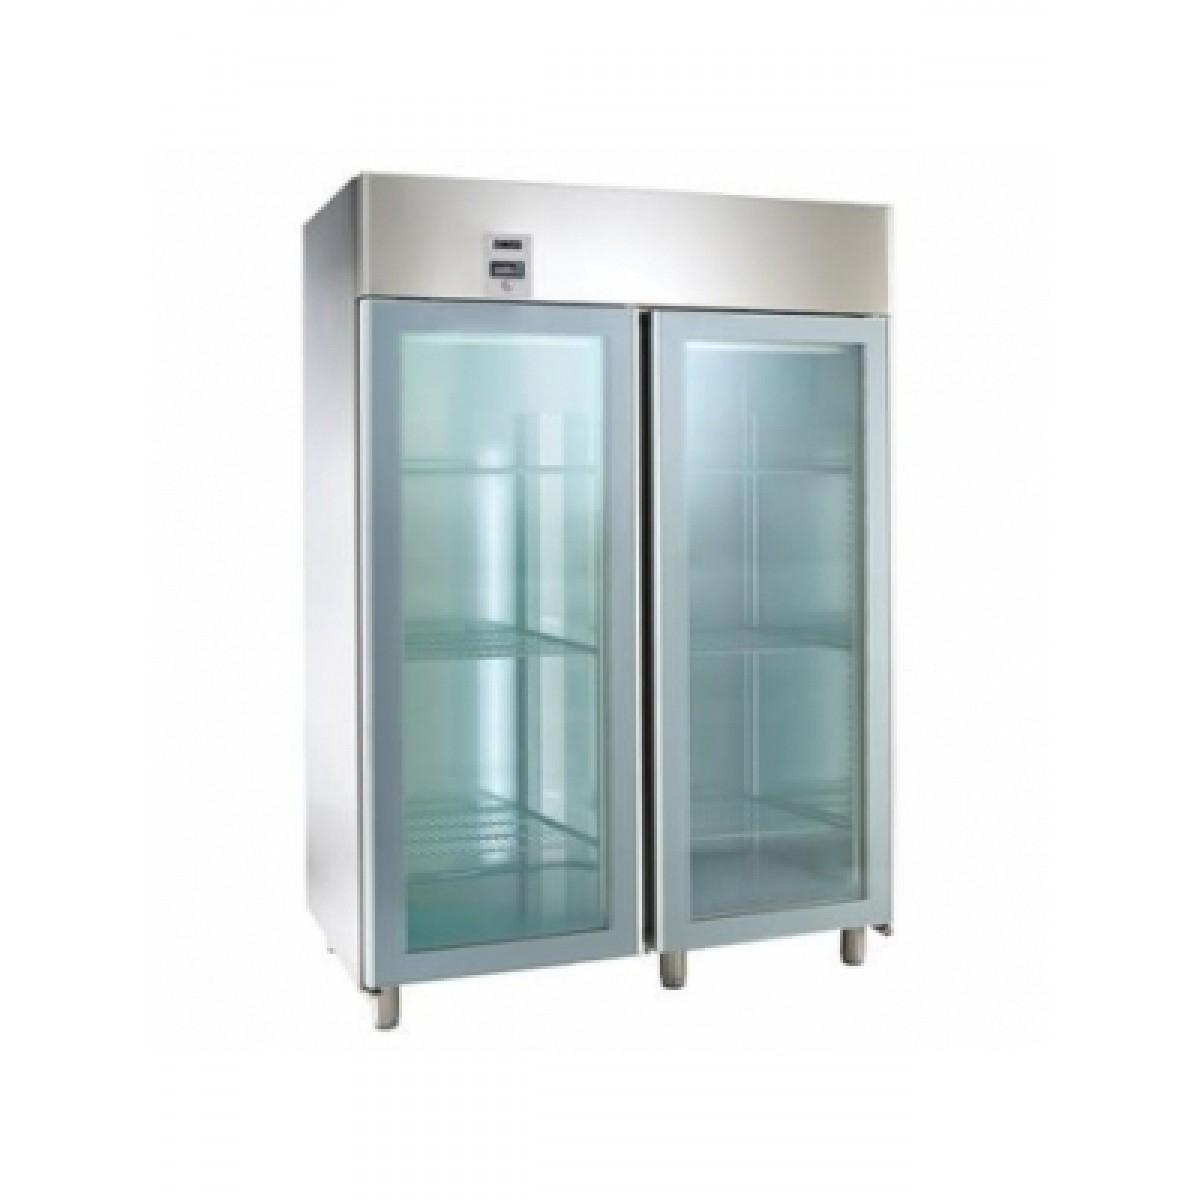 Fritstående fryseskab med glasdør dobbelt låge